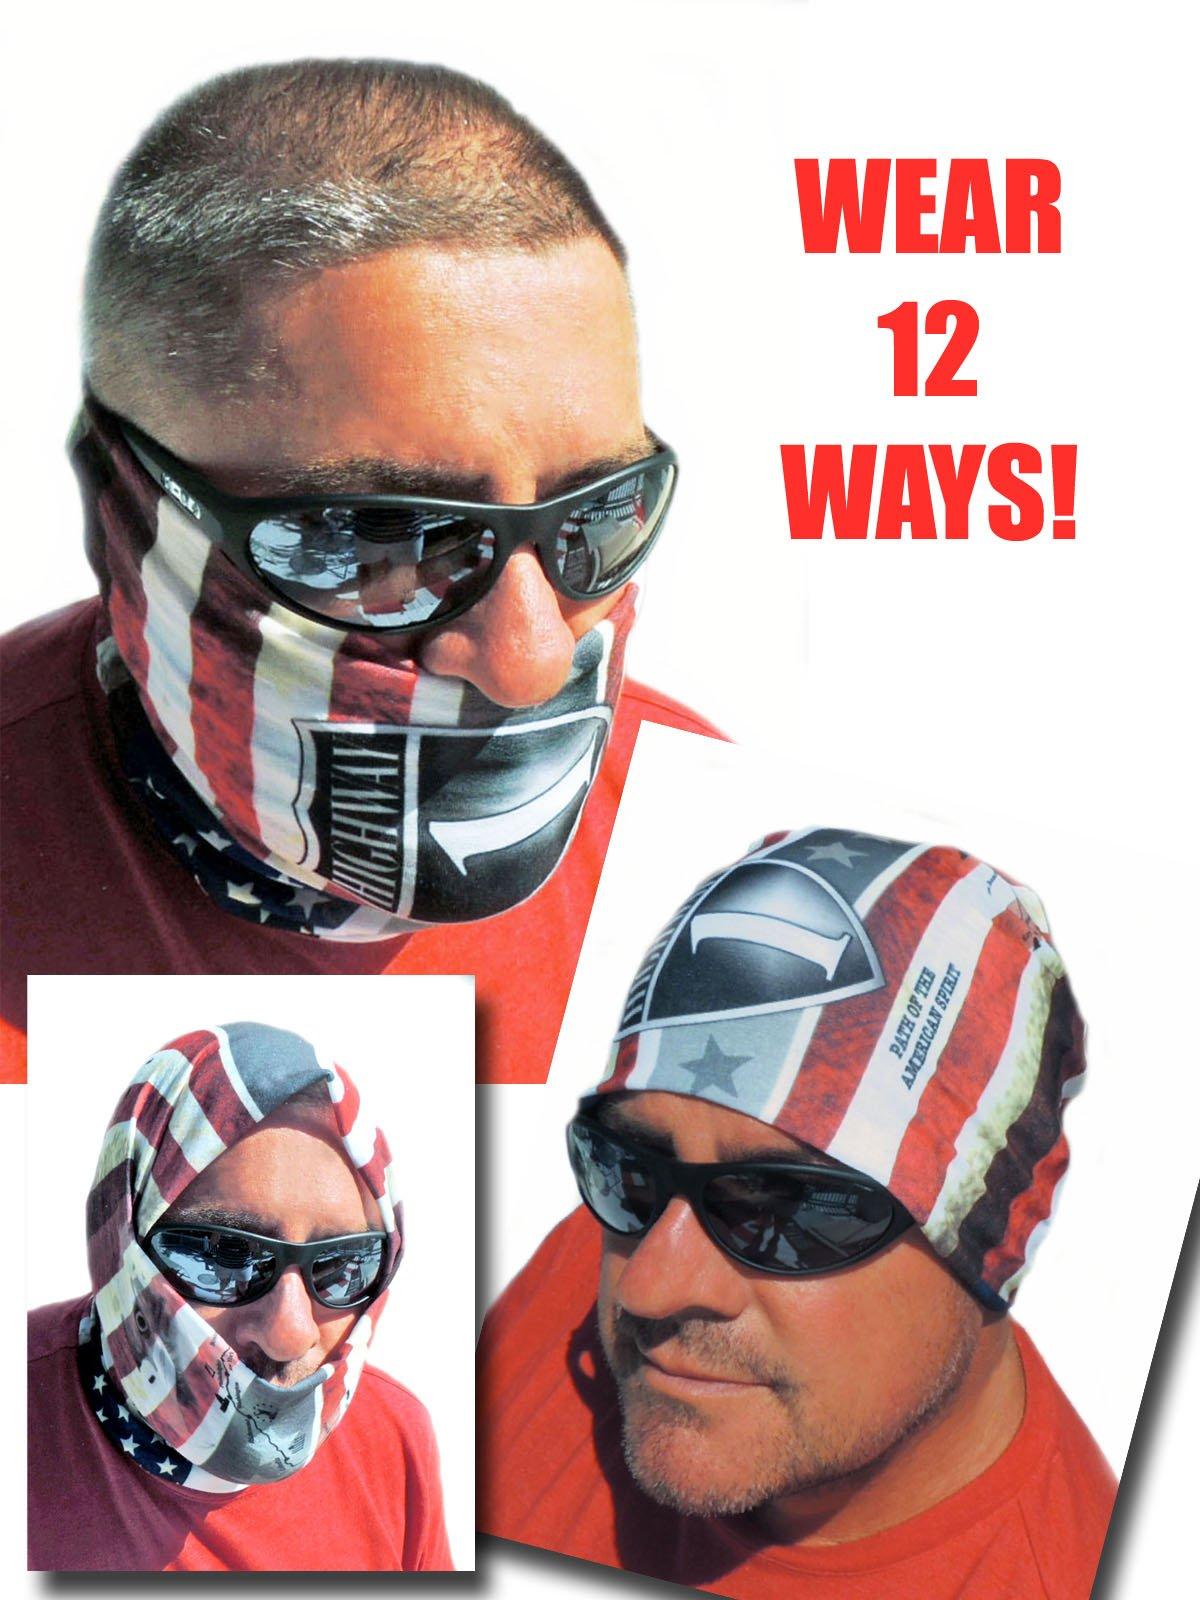 12-in-1 Headband - US American Flag Versatile Sports & Casual Headwear - Wear as a Bandana, Neck Gaiter, Balaclava, Helmet Liner, Mask - High Performance Microfiber